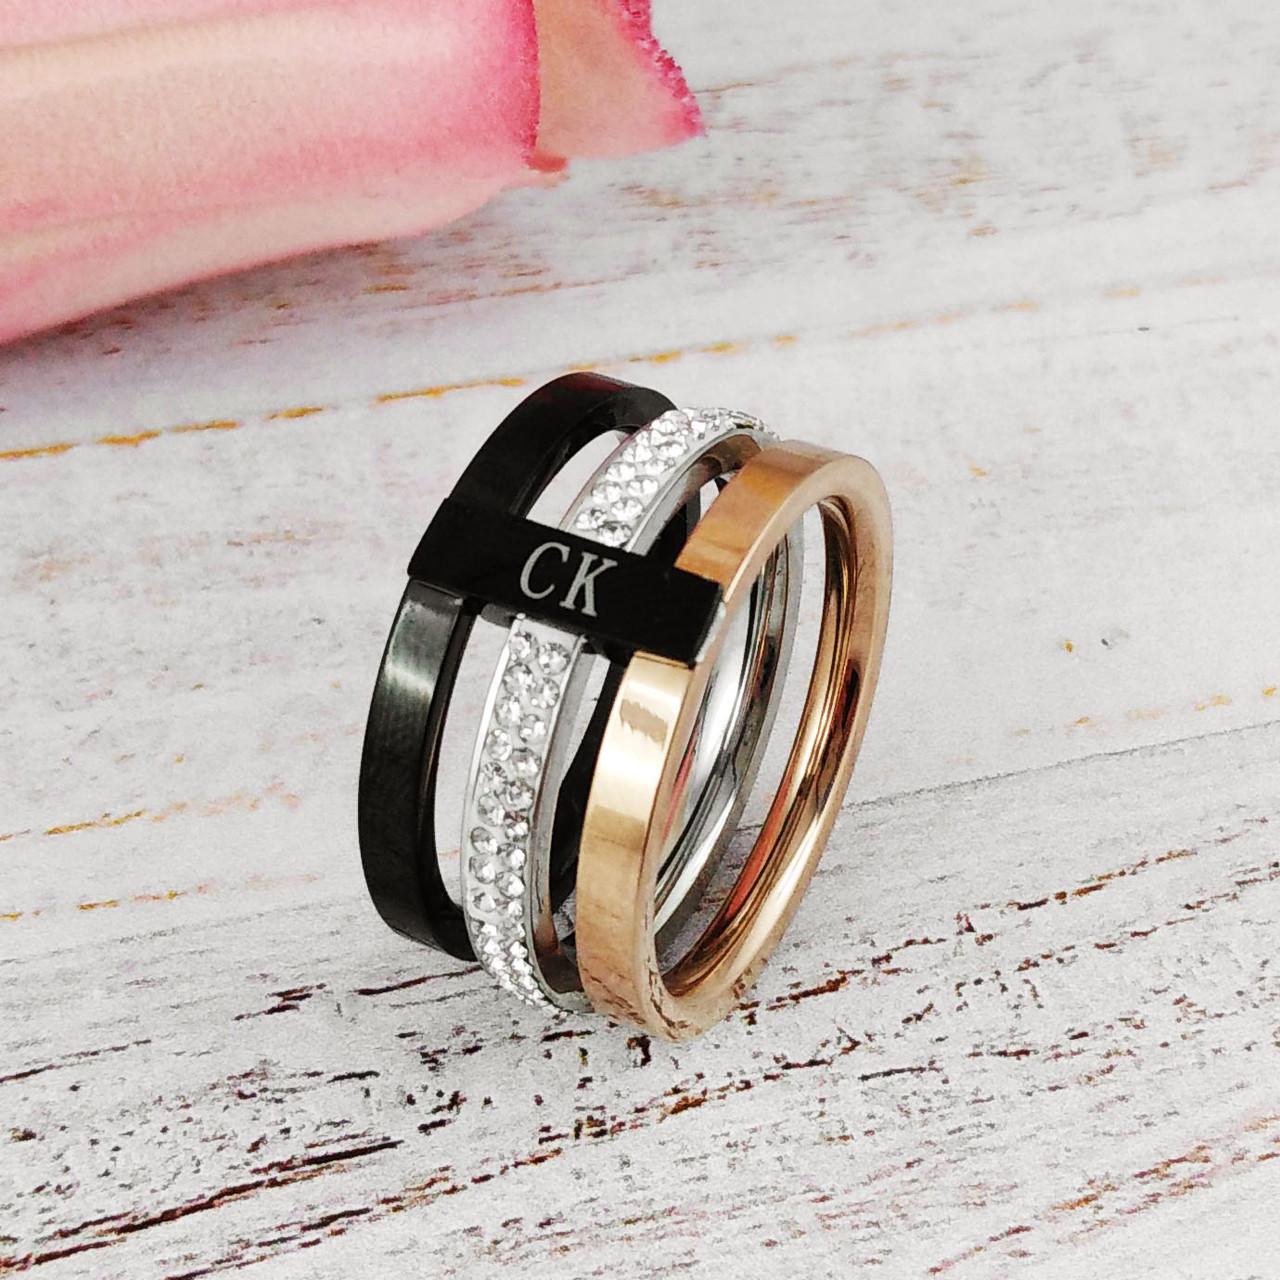 "Кольцо Xuping Jewelry размер 17 ""СК"". А/В 2896"